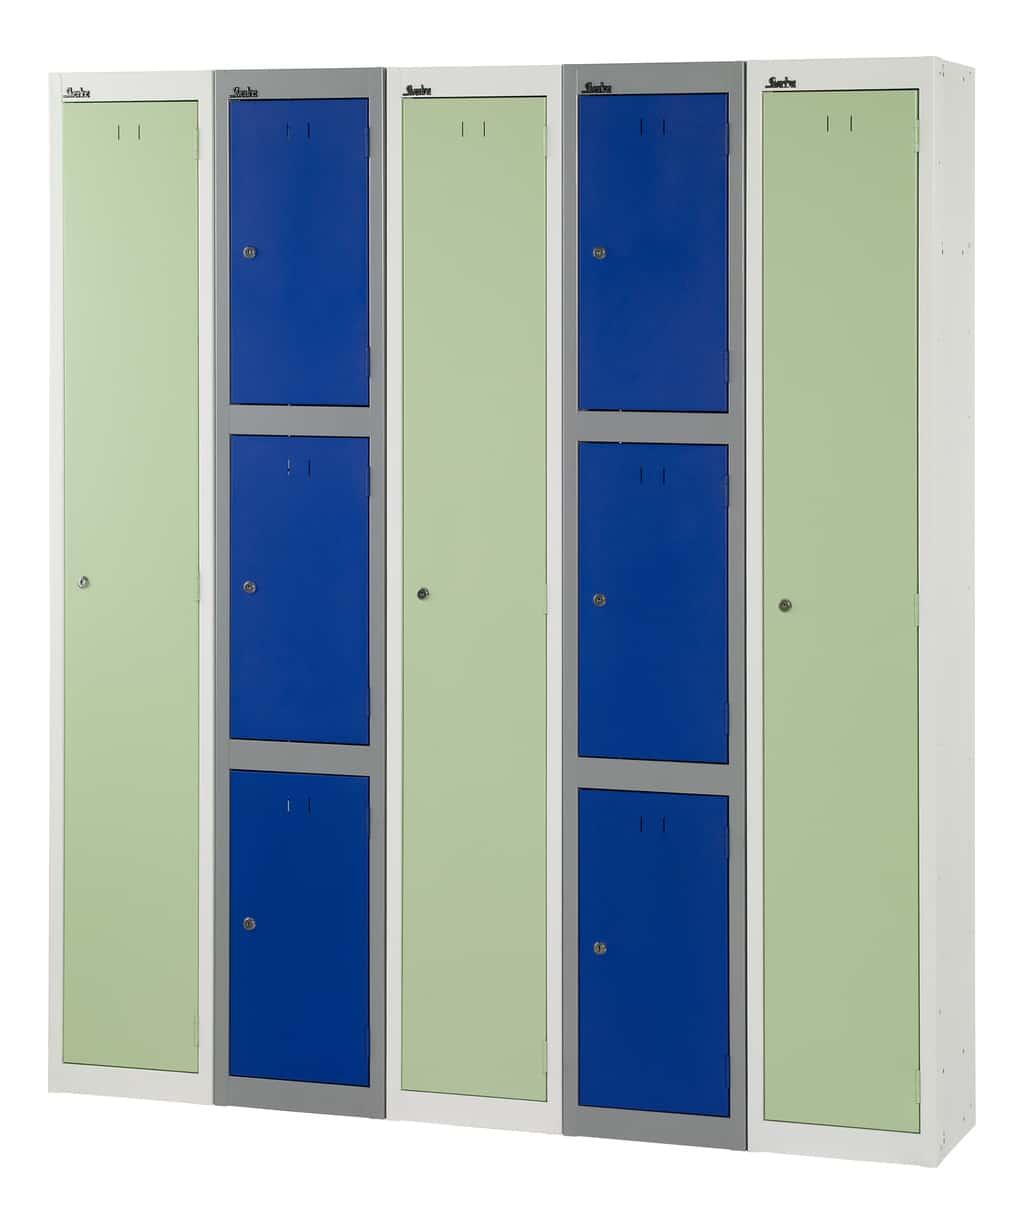 Leisure Storage Furniture Blueline Office Furniture